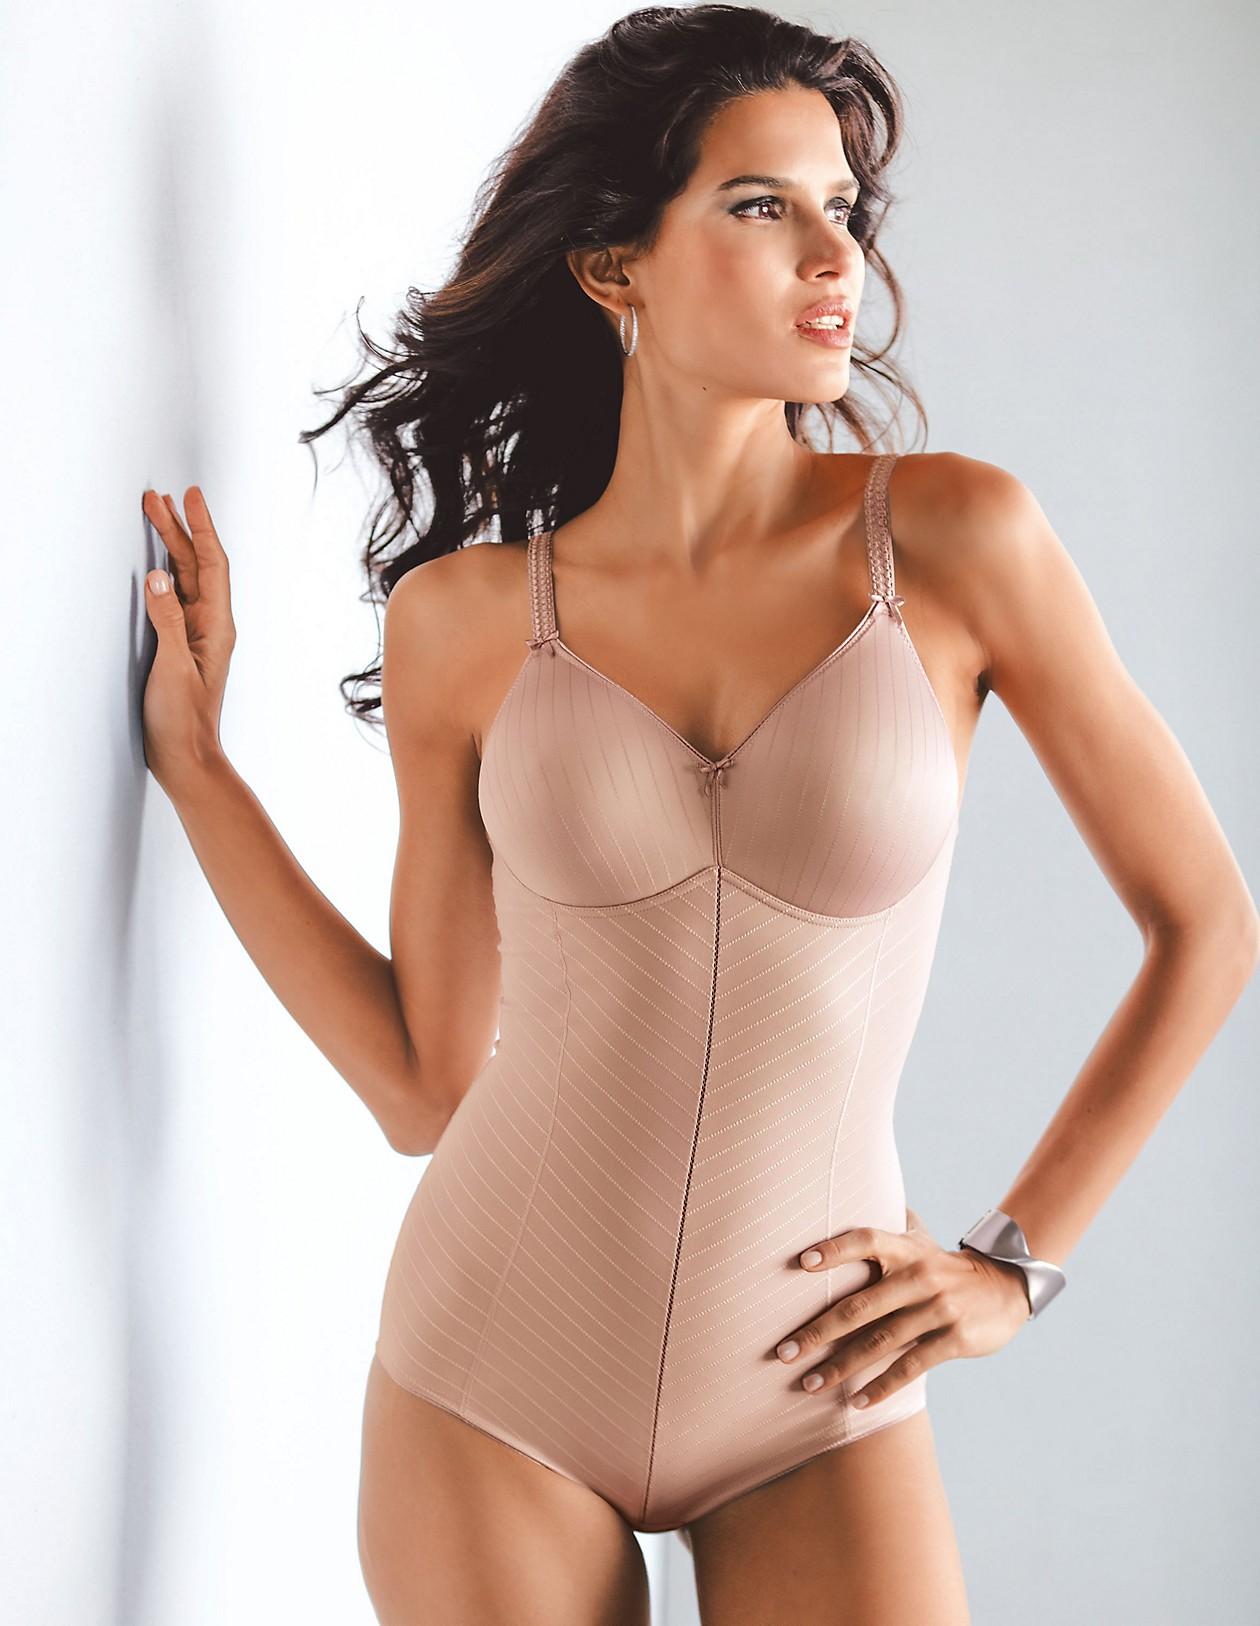 f39fafe71 Felina Spacer Body ohne Bügel, perlrosa, rosa | MADELEINE Mode